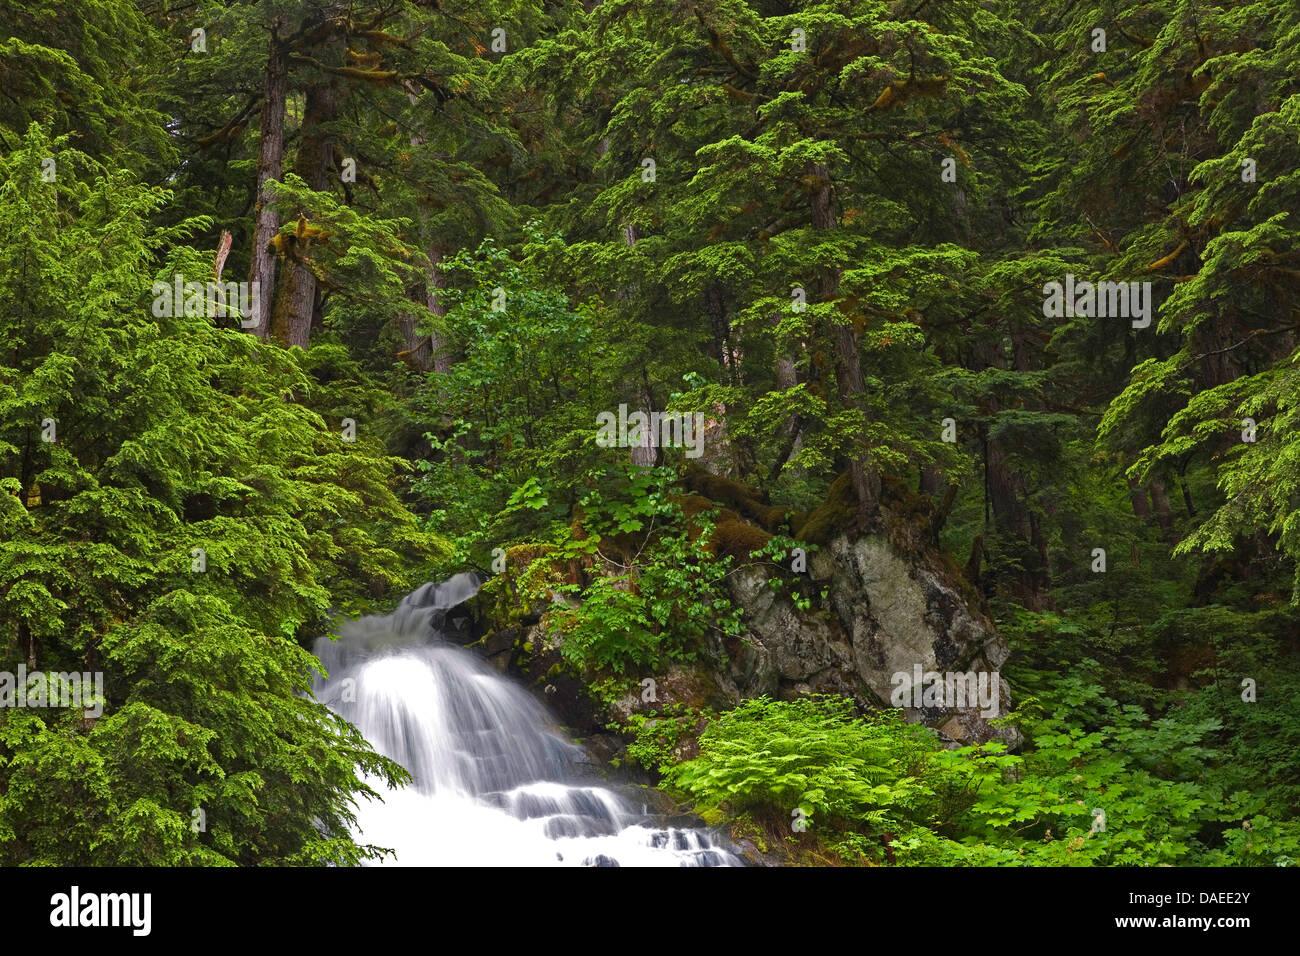 mountains waterfalls forest usa - photo #27